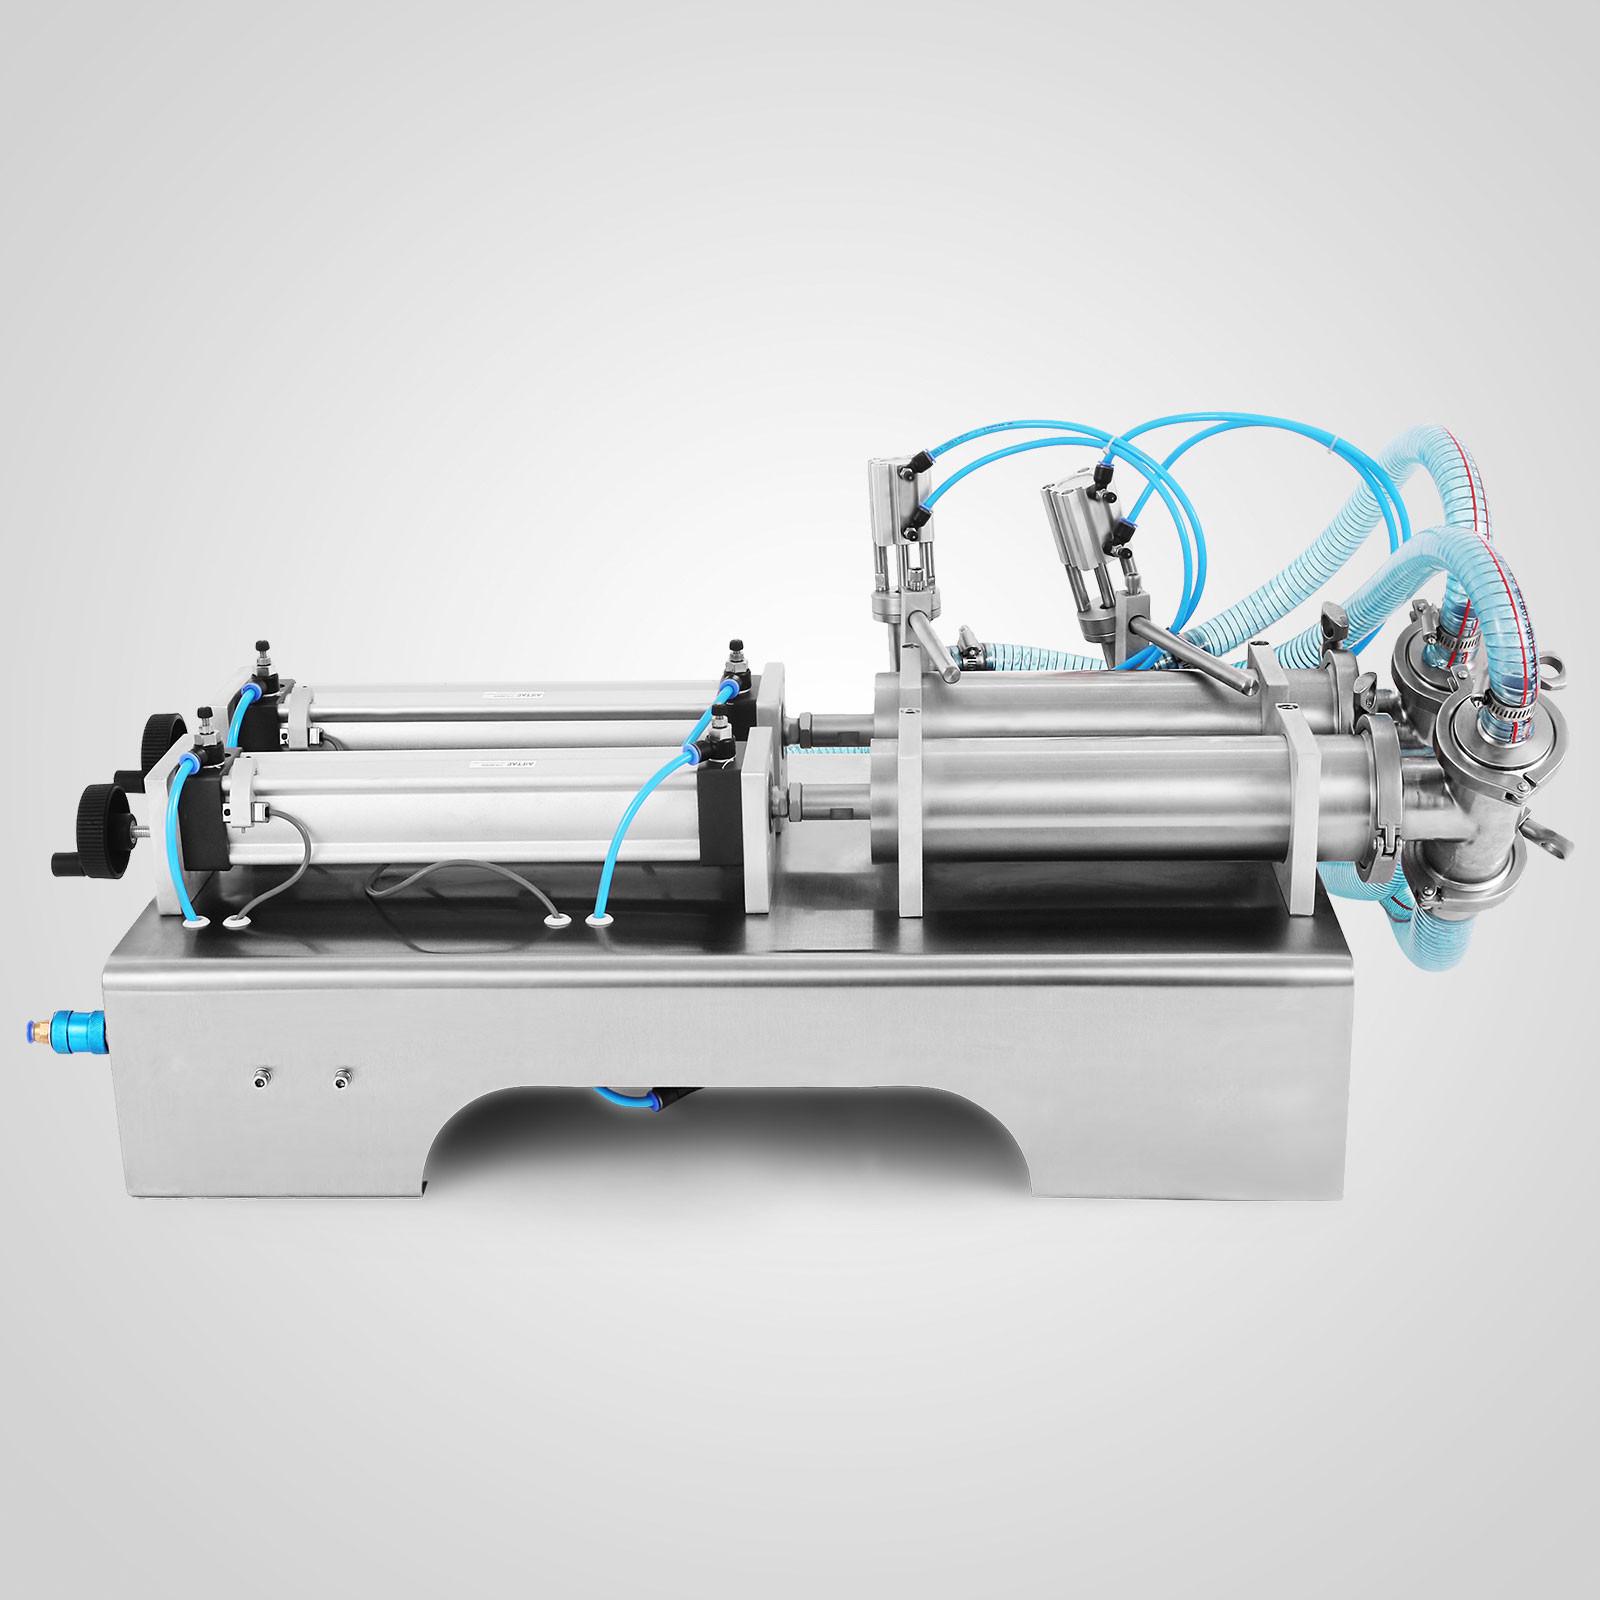 Liquid-Filling-Machine-Filler-Remplissage-2-3500ML-50-500ML-INDUSTRY-SUPPLY miniature 79